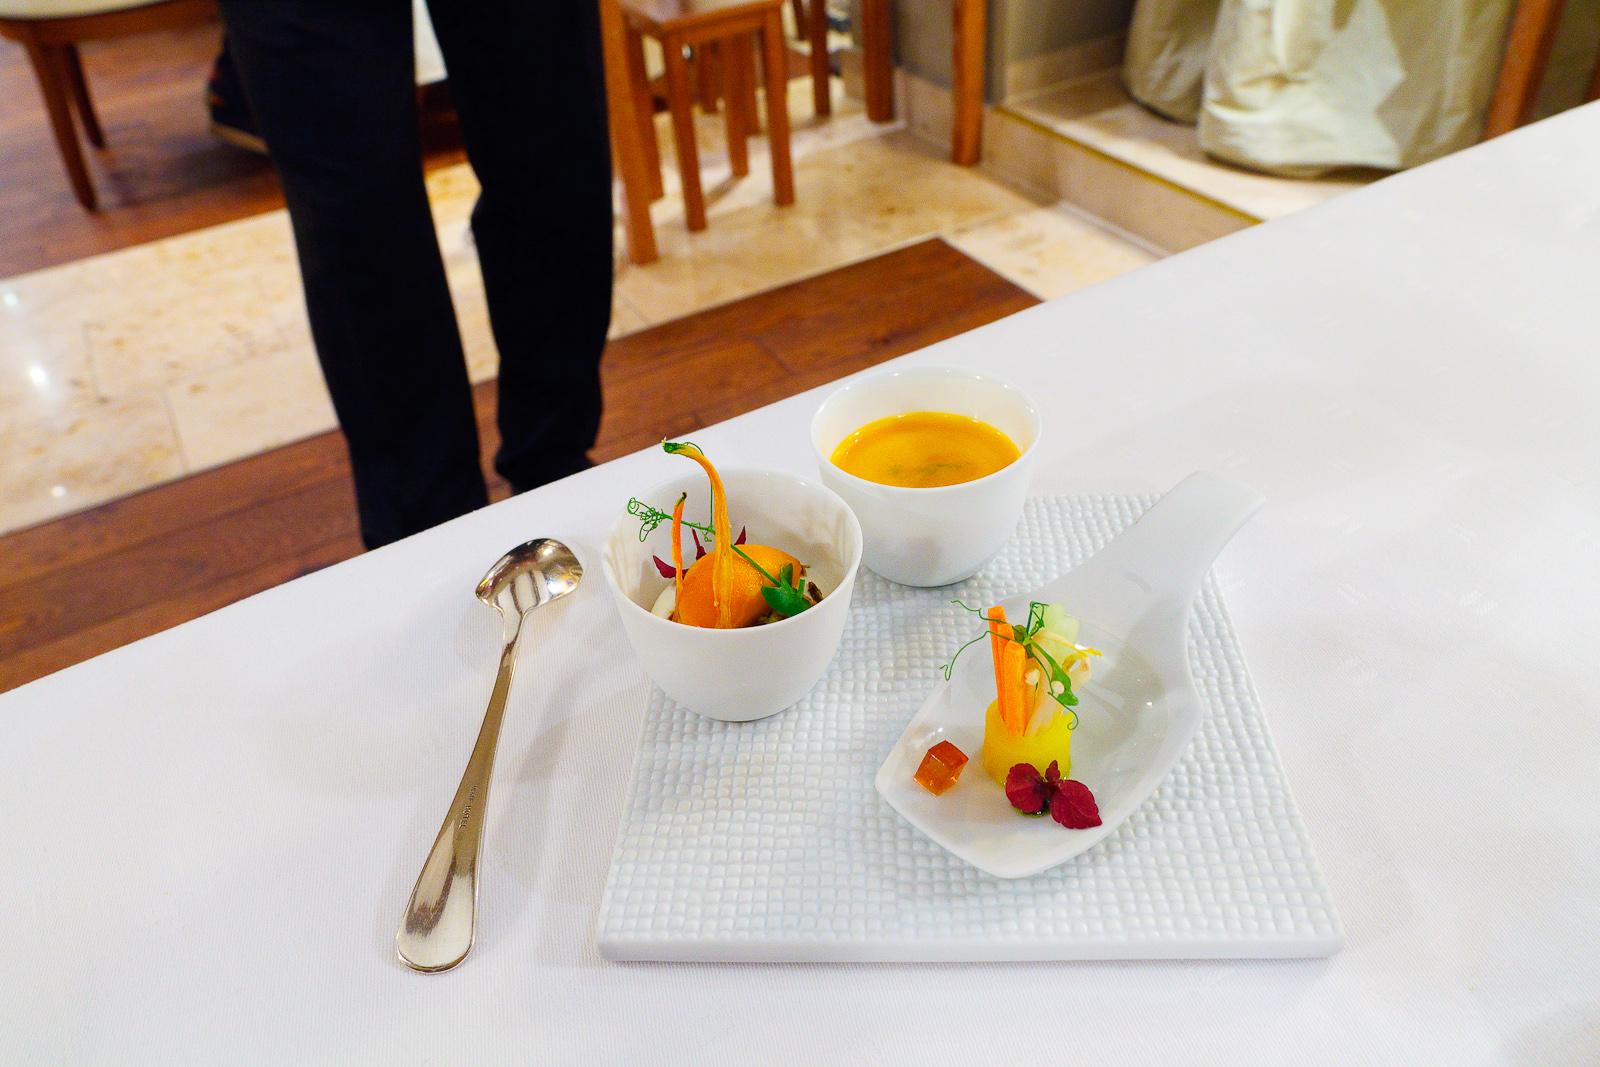 Amuse Bouche 8: Bio-carotte with yogurt and coriander